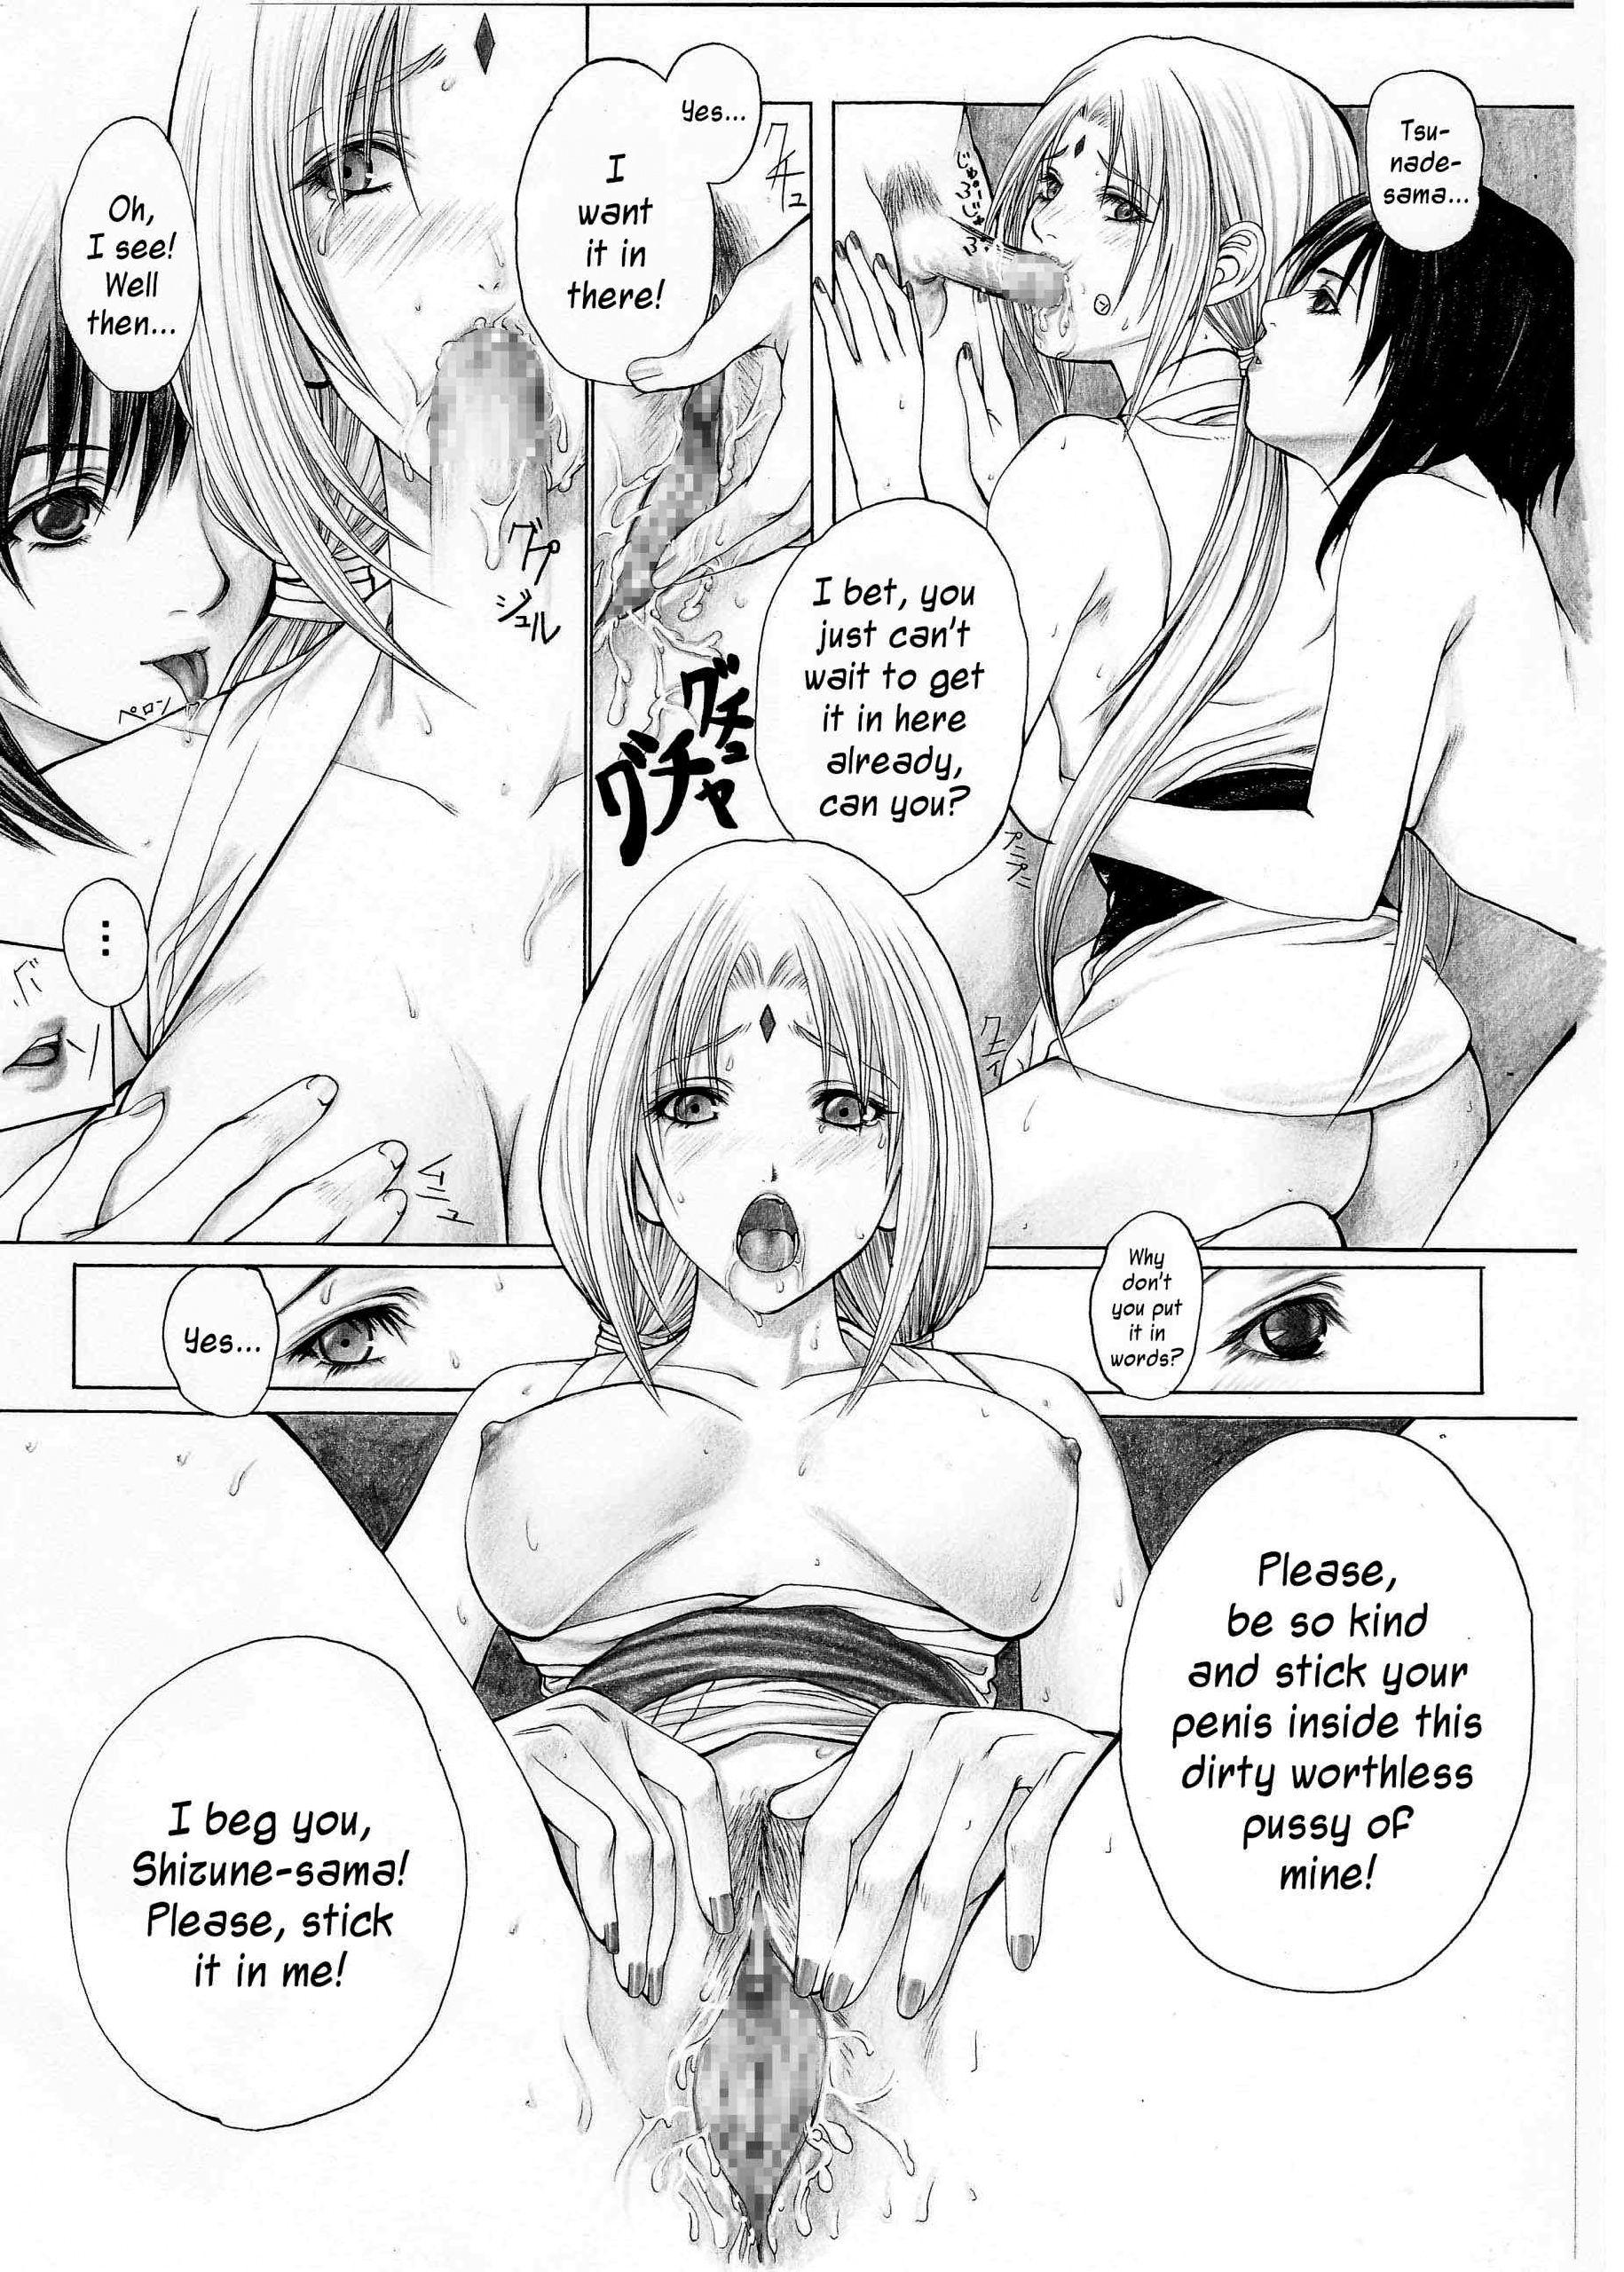 Nyonin han hentai manga picture 20